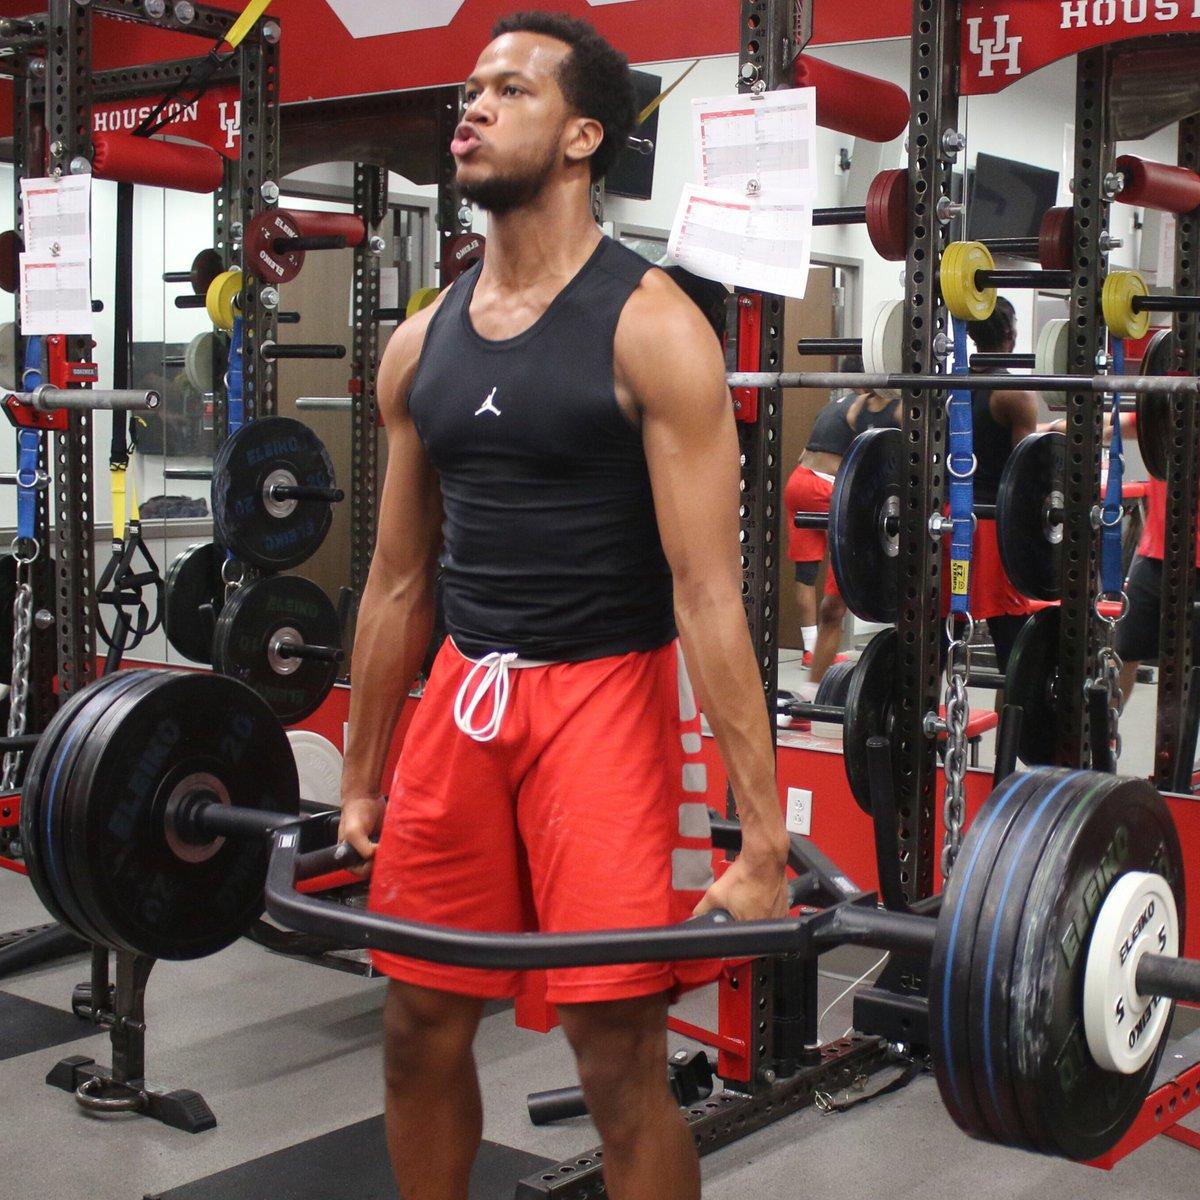 91e86b4e5ea Strength is never a weaknesspic.twitter.com/Uuz9vWyEZK · Houston Men's Hoops  ...